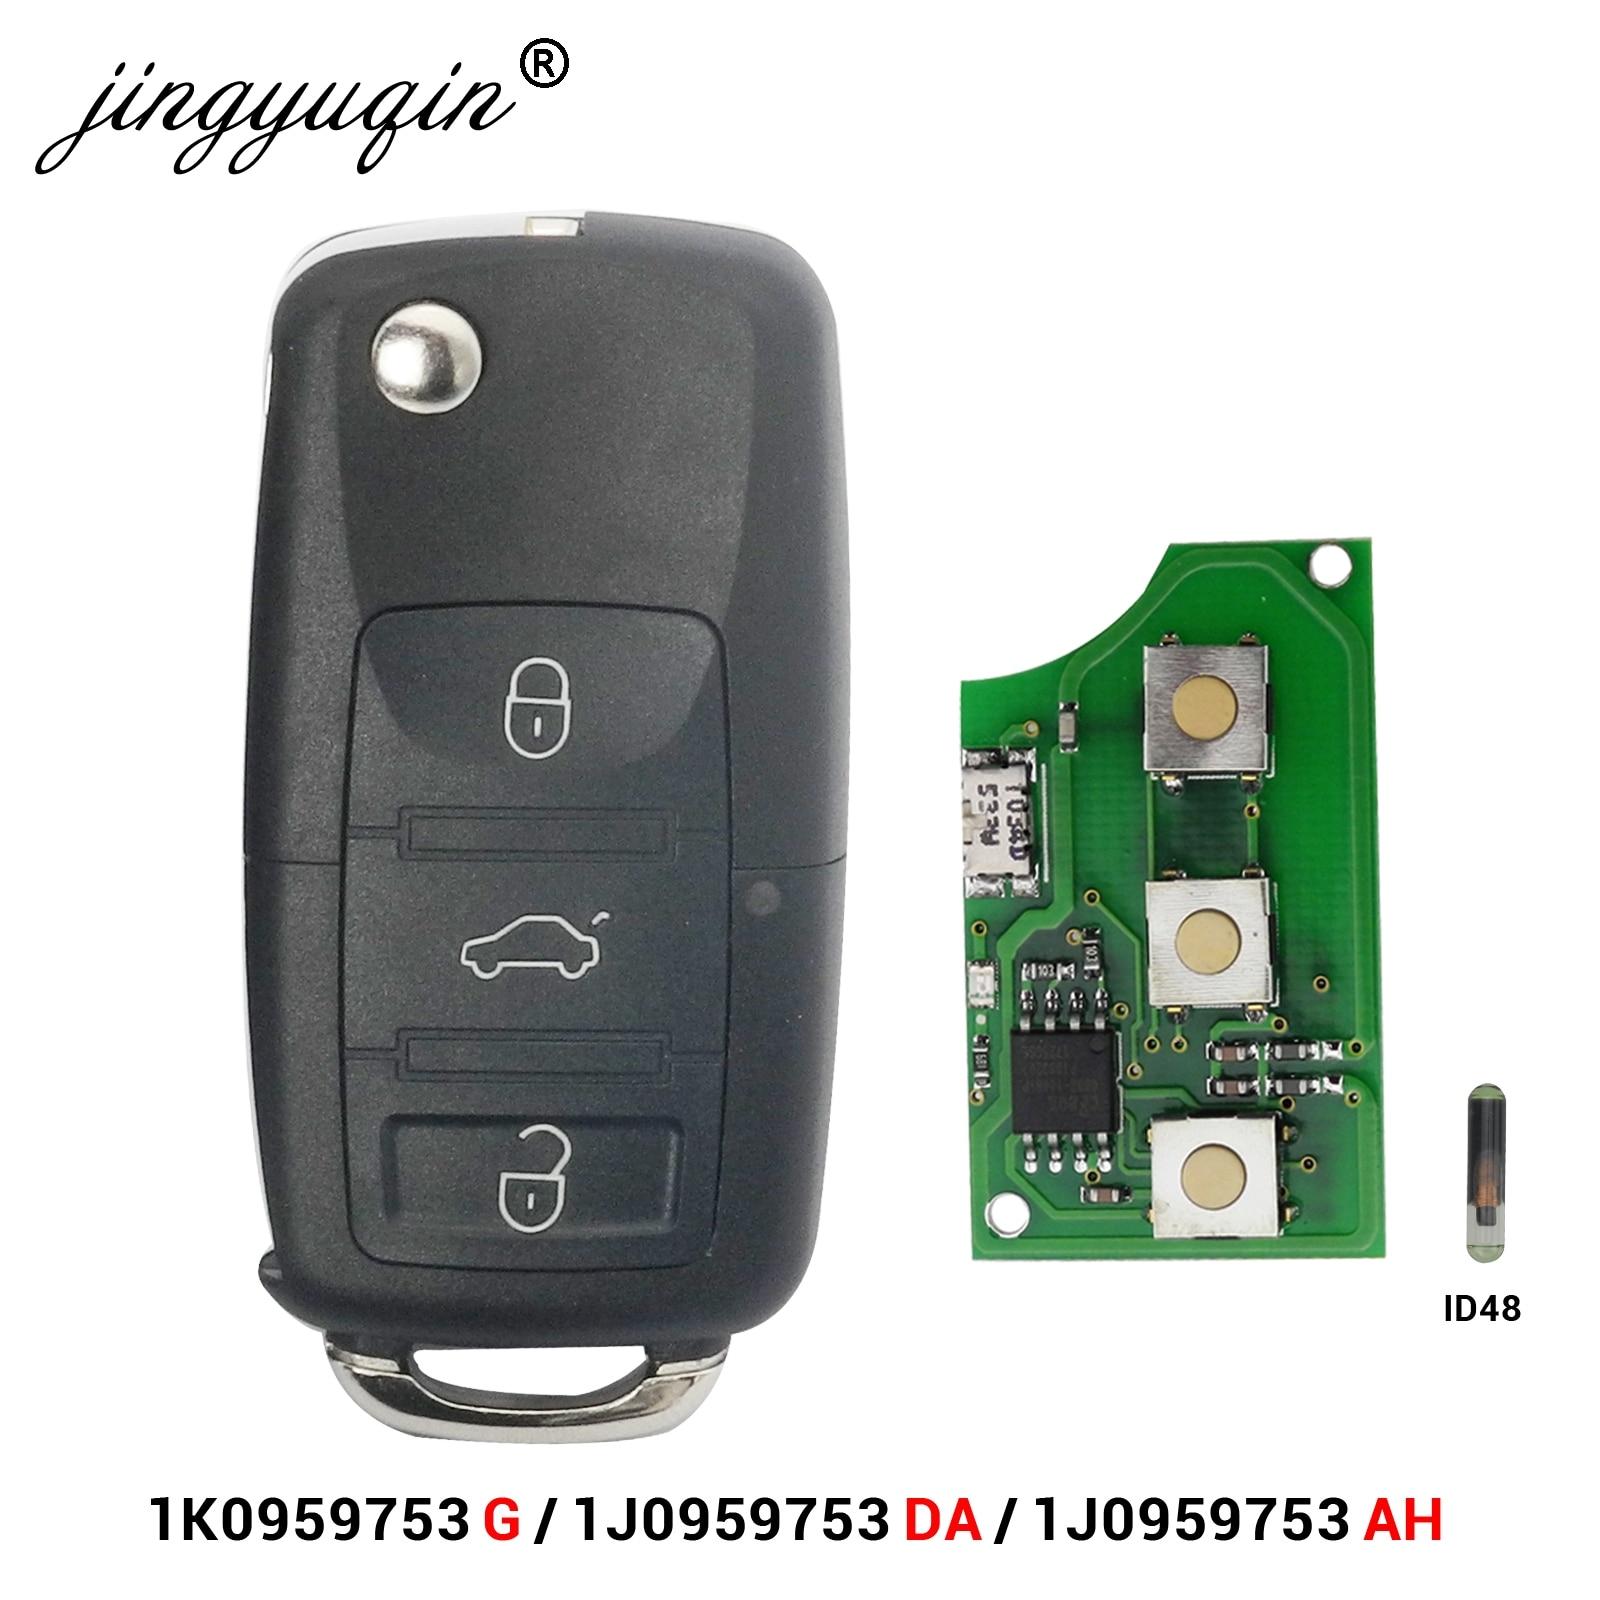 Флип-чехол jingyuqin с 3 кнопками для VW PASSAT Polo Skoda Seat Polo/Golf/Beetle 1J0959753 DA/AH 1K0959753G 434 МГц ID48